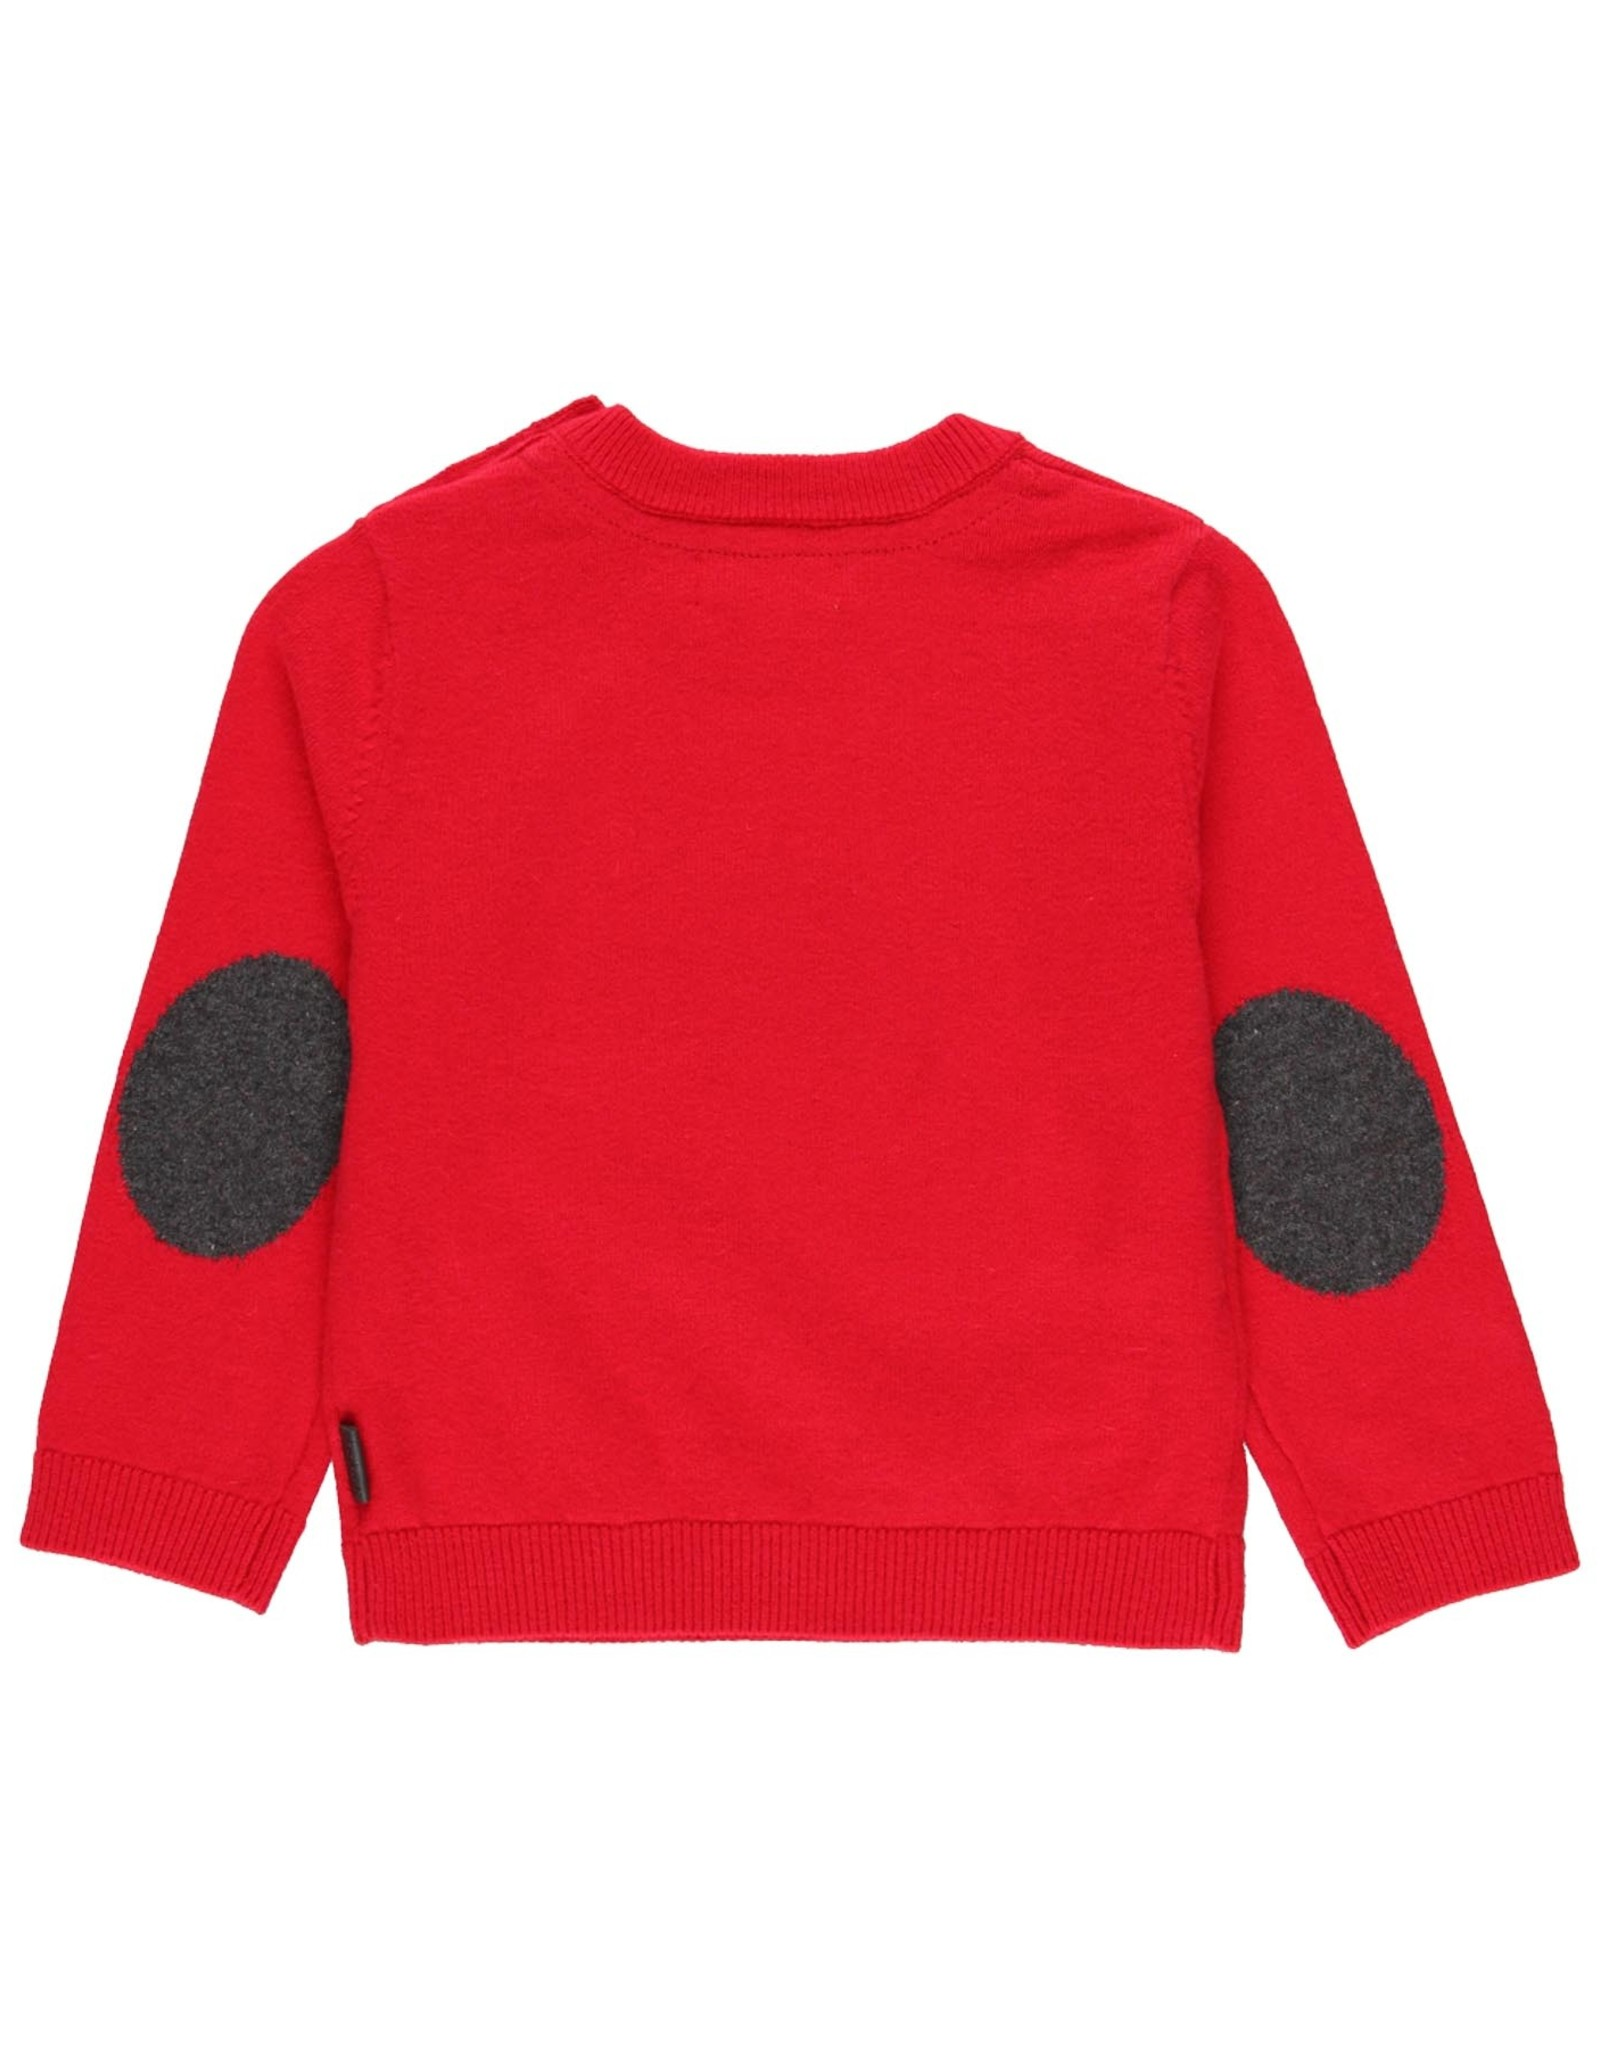 Boboli Sweater, Car, Red & Grey